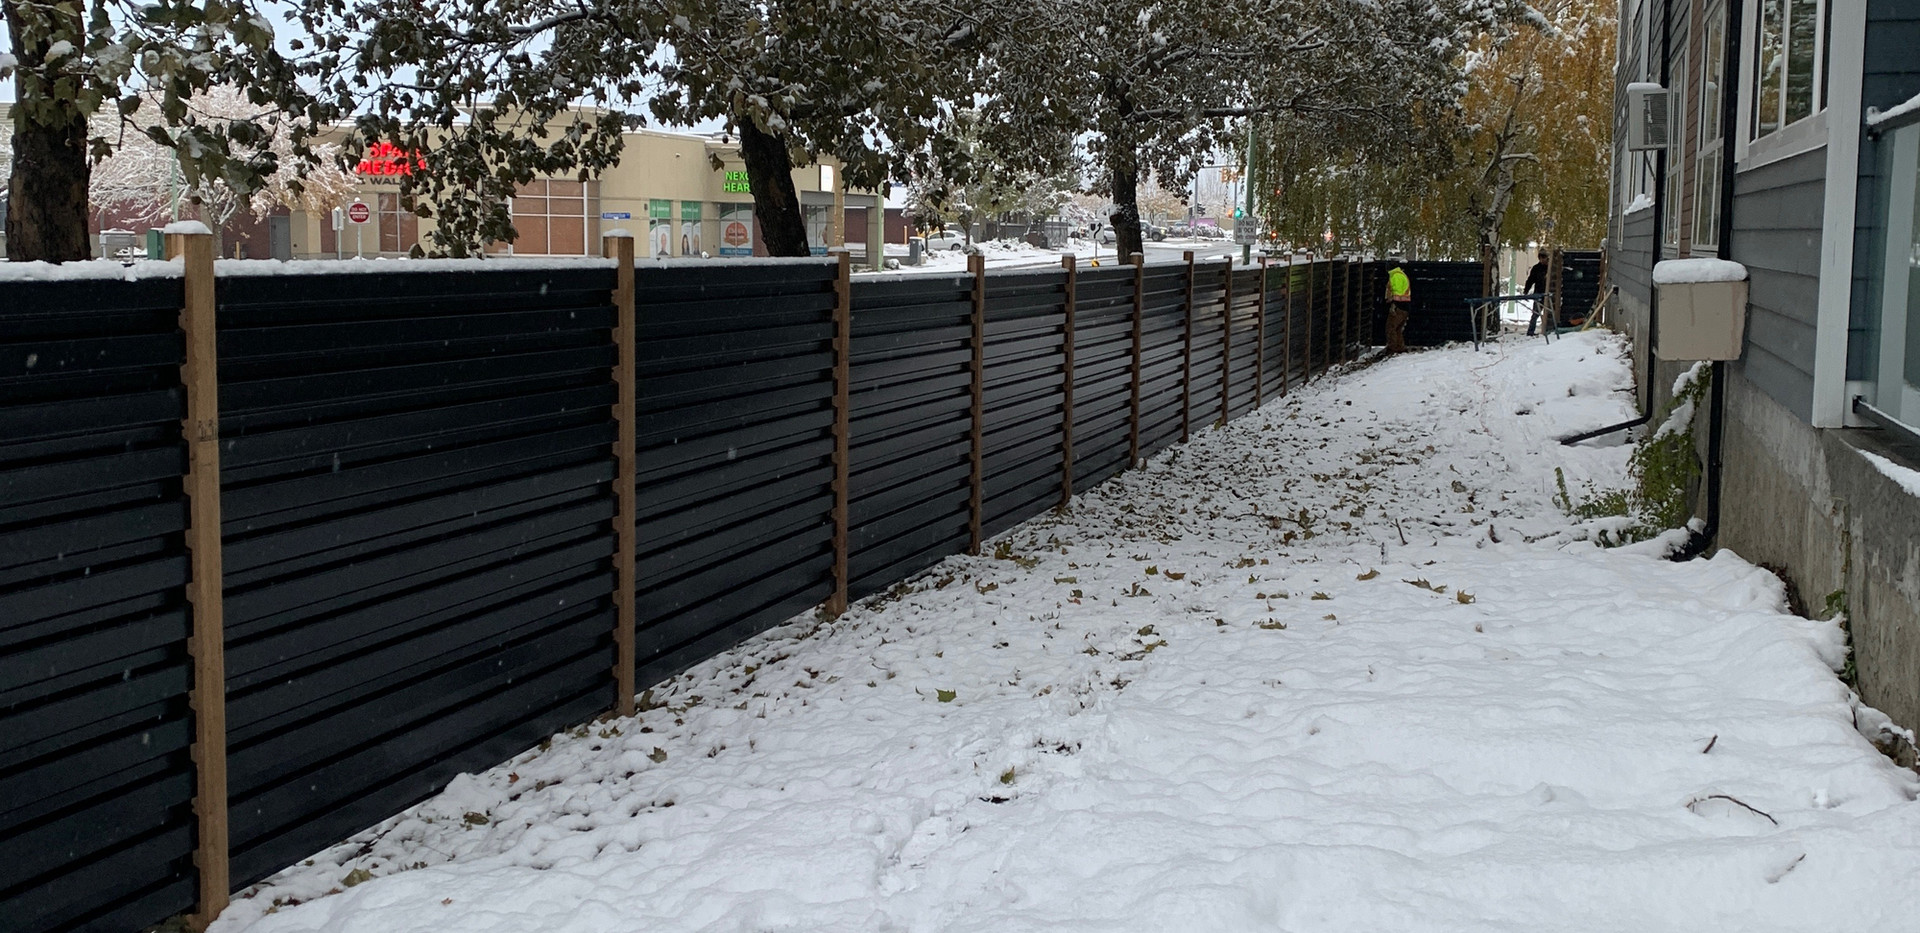 Black corrugated